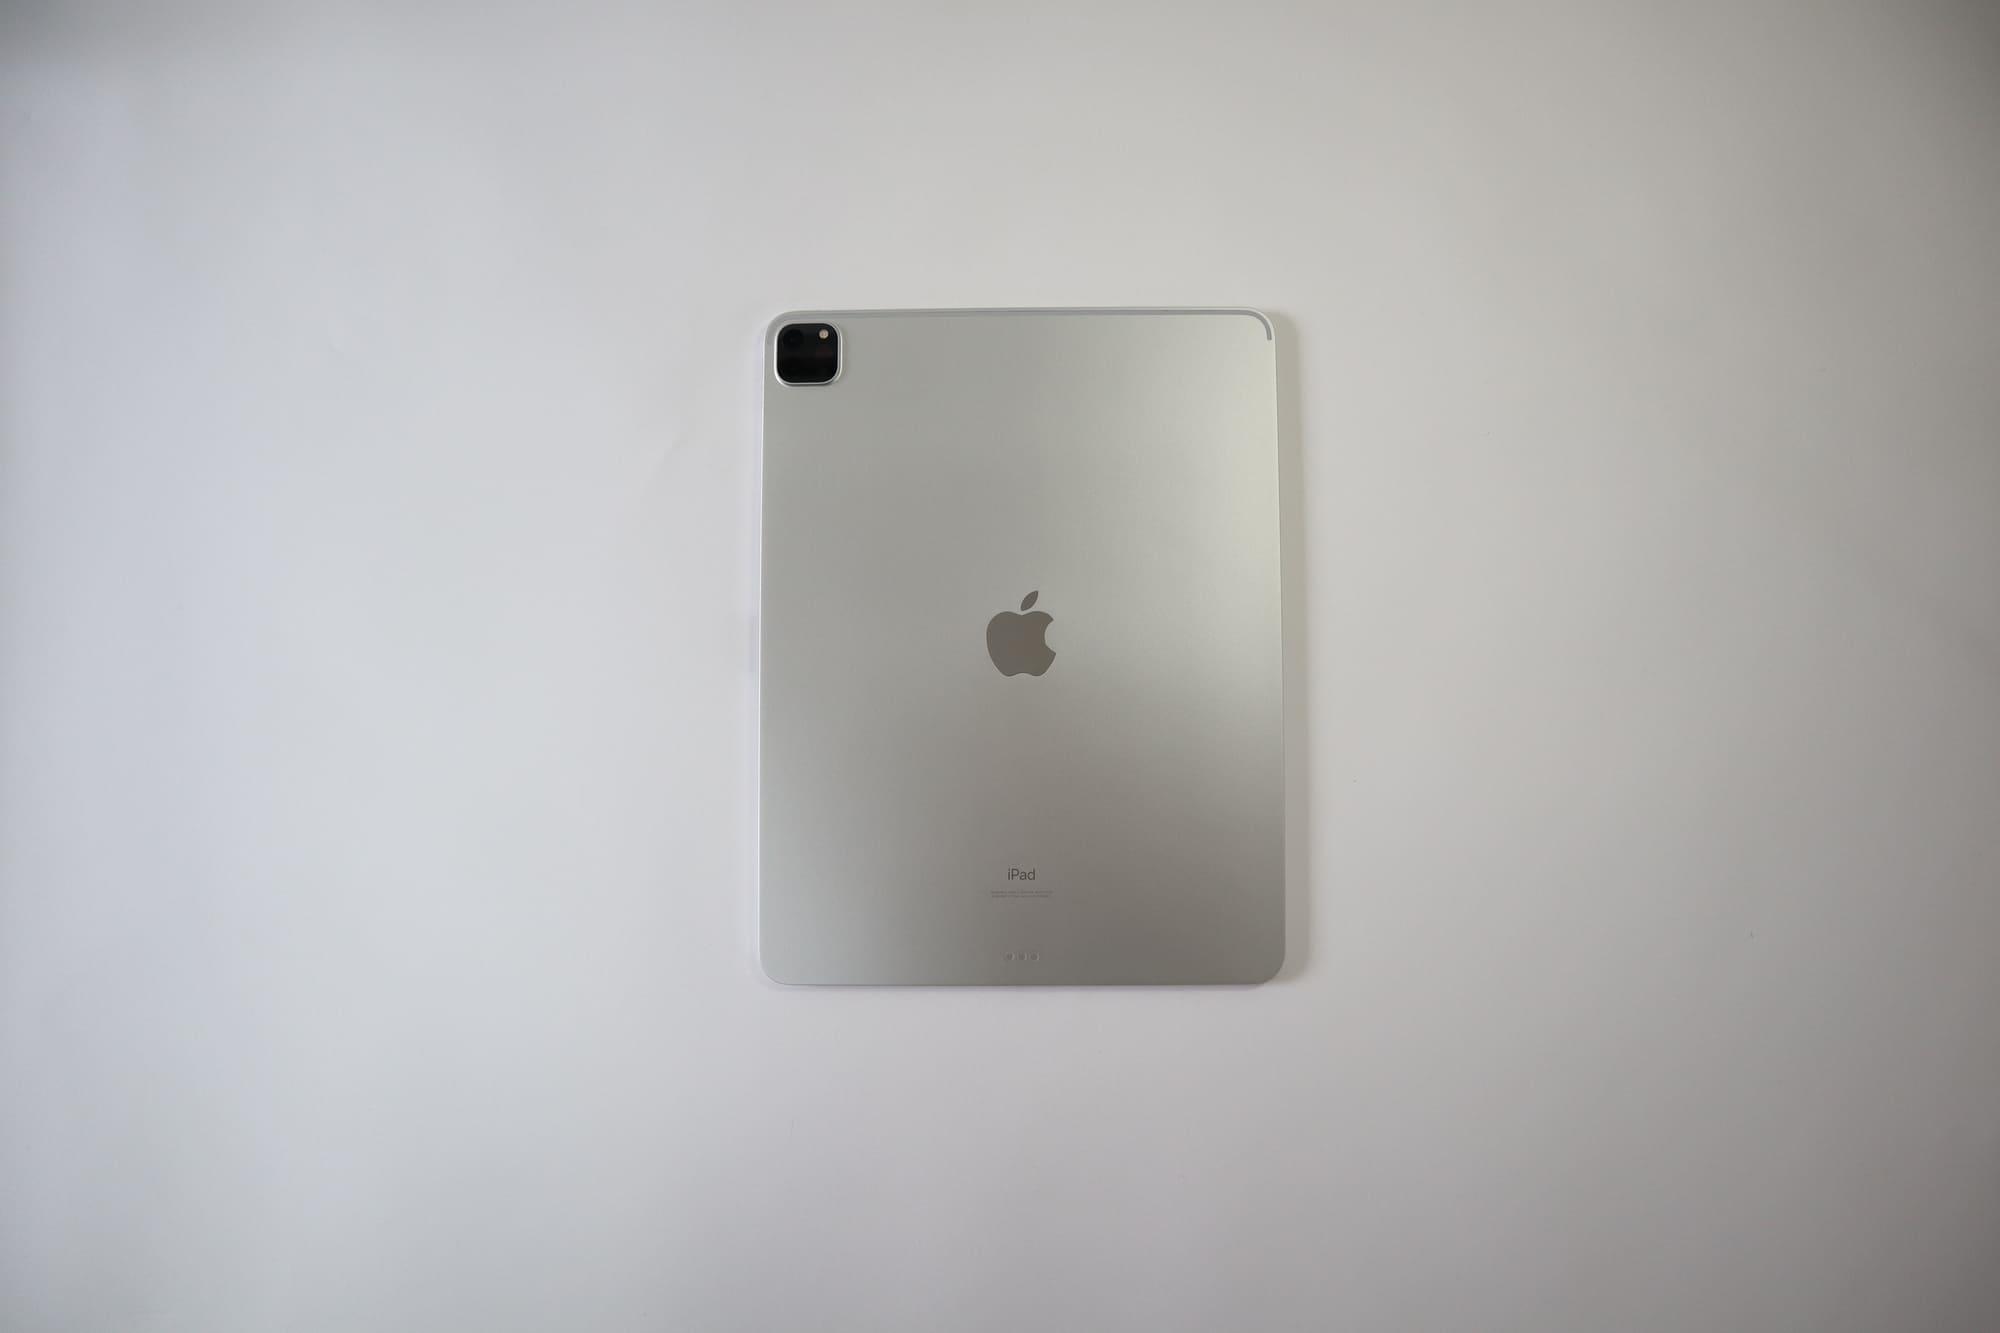 iPad Proの外観デザイン